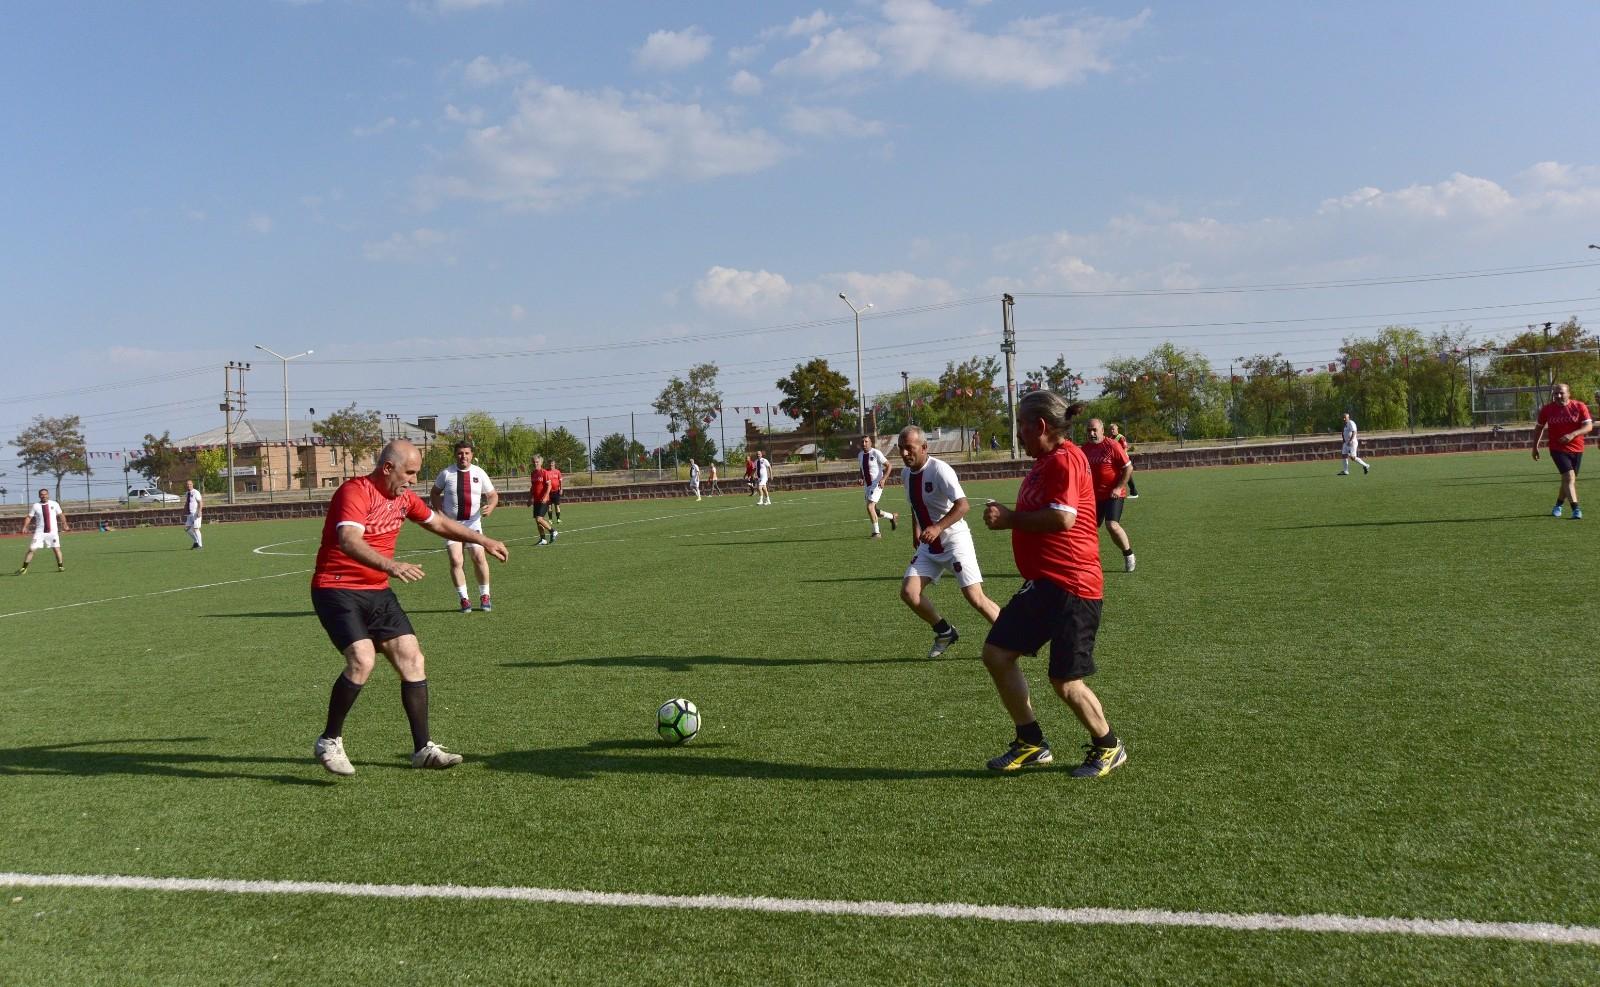 Ahlat'ta 50 yaş üstü eski futbolcular tekrar yeşil sahalara kavuştular